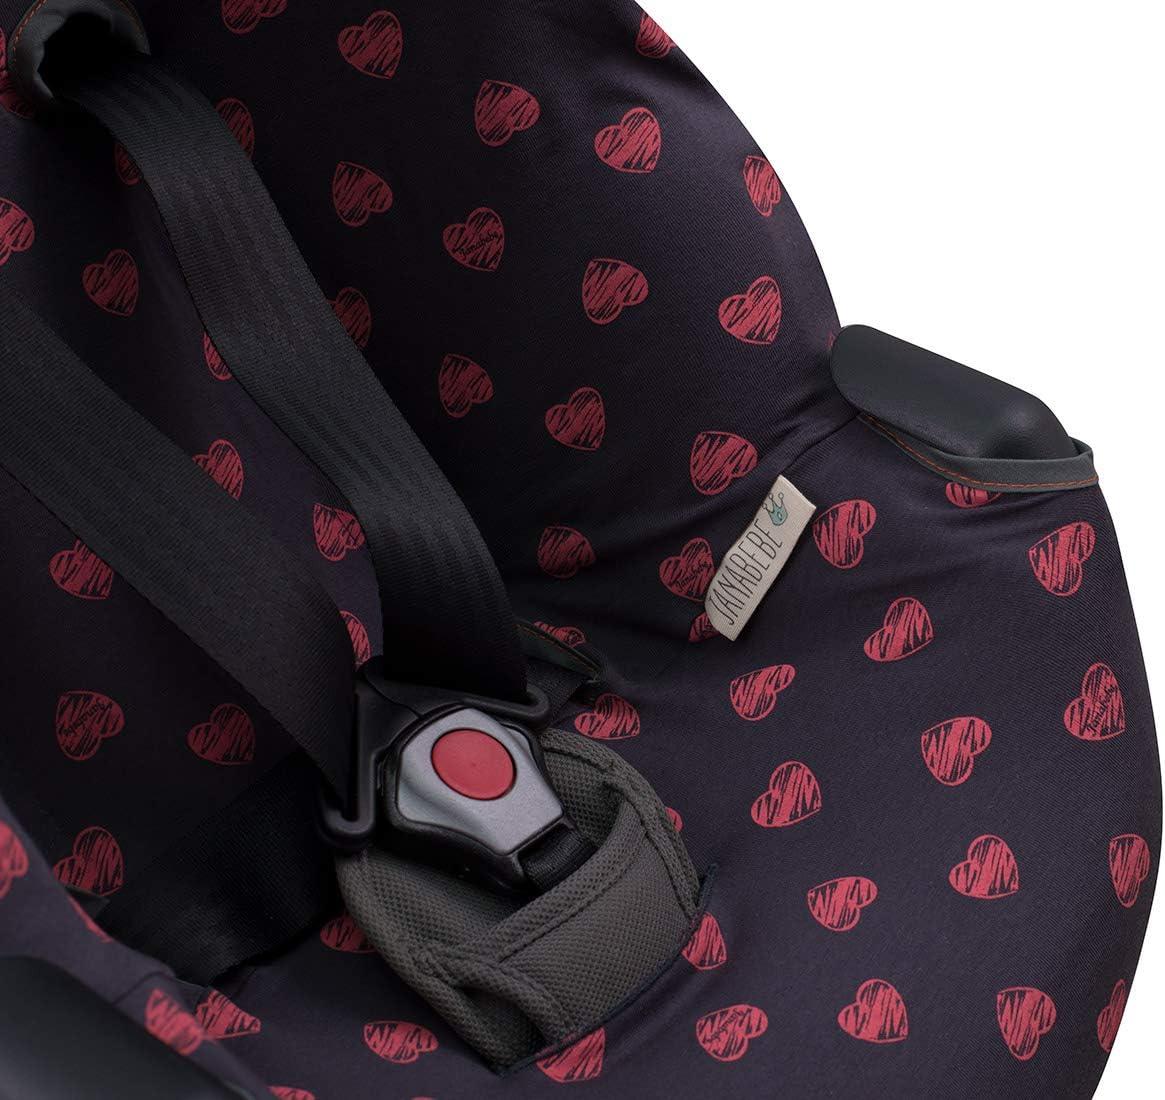 Nuna REBL Janabebe Car seat Cover Liner Joie Spin 360 Fluor Heart